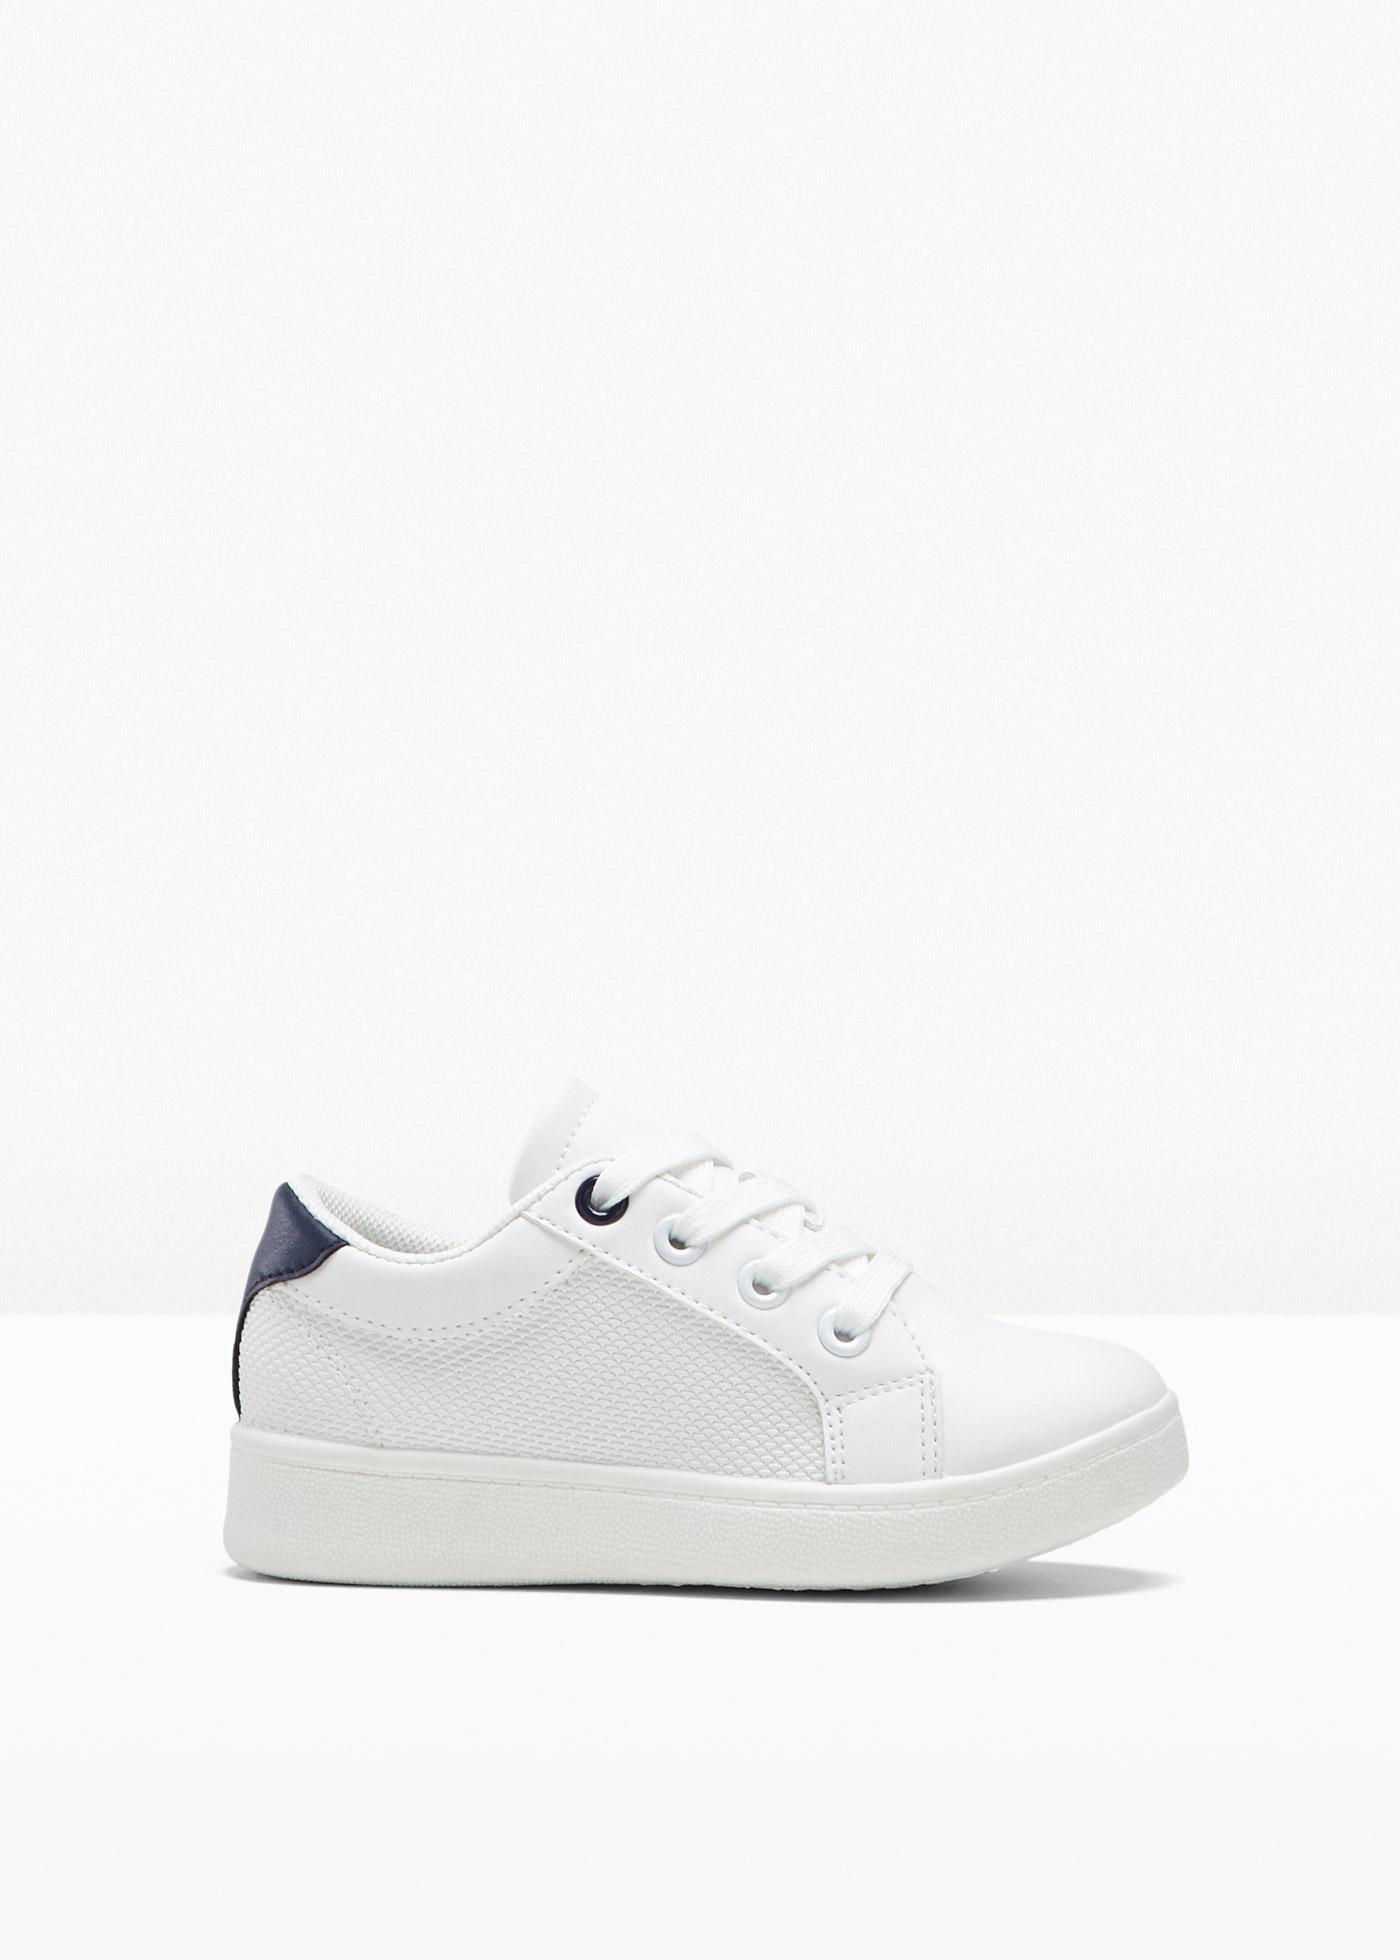 bonprix Sneakers for barn 27,28,29